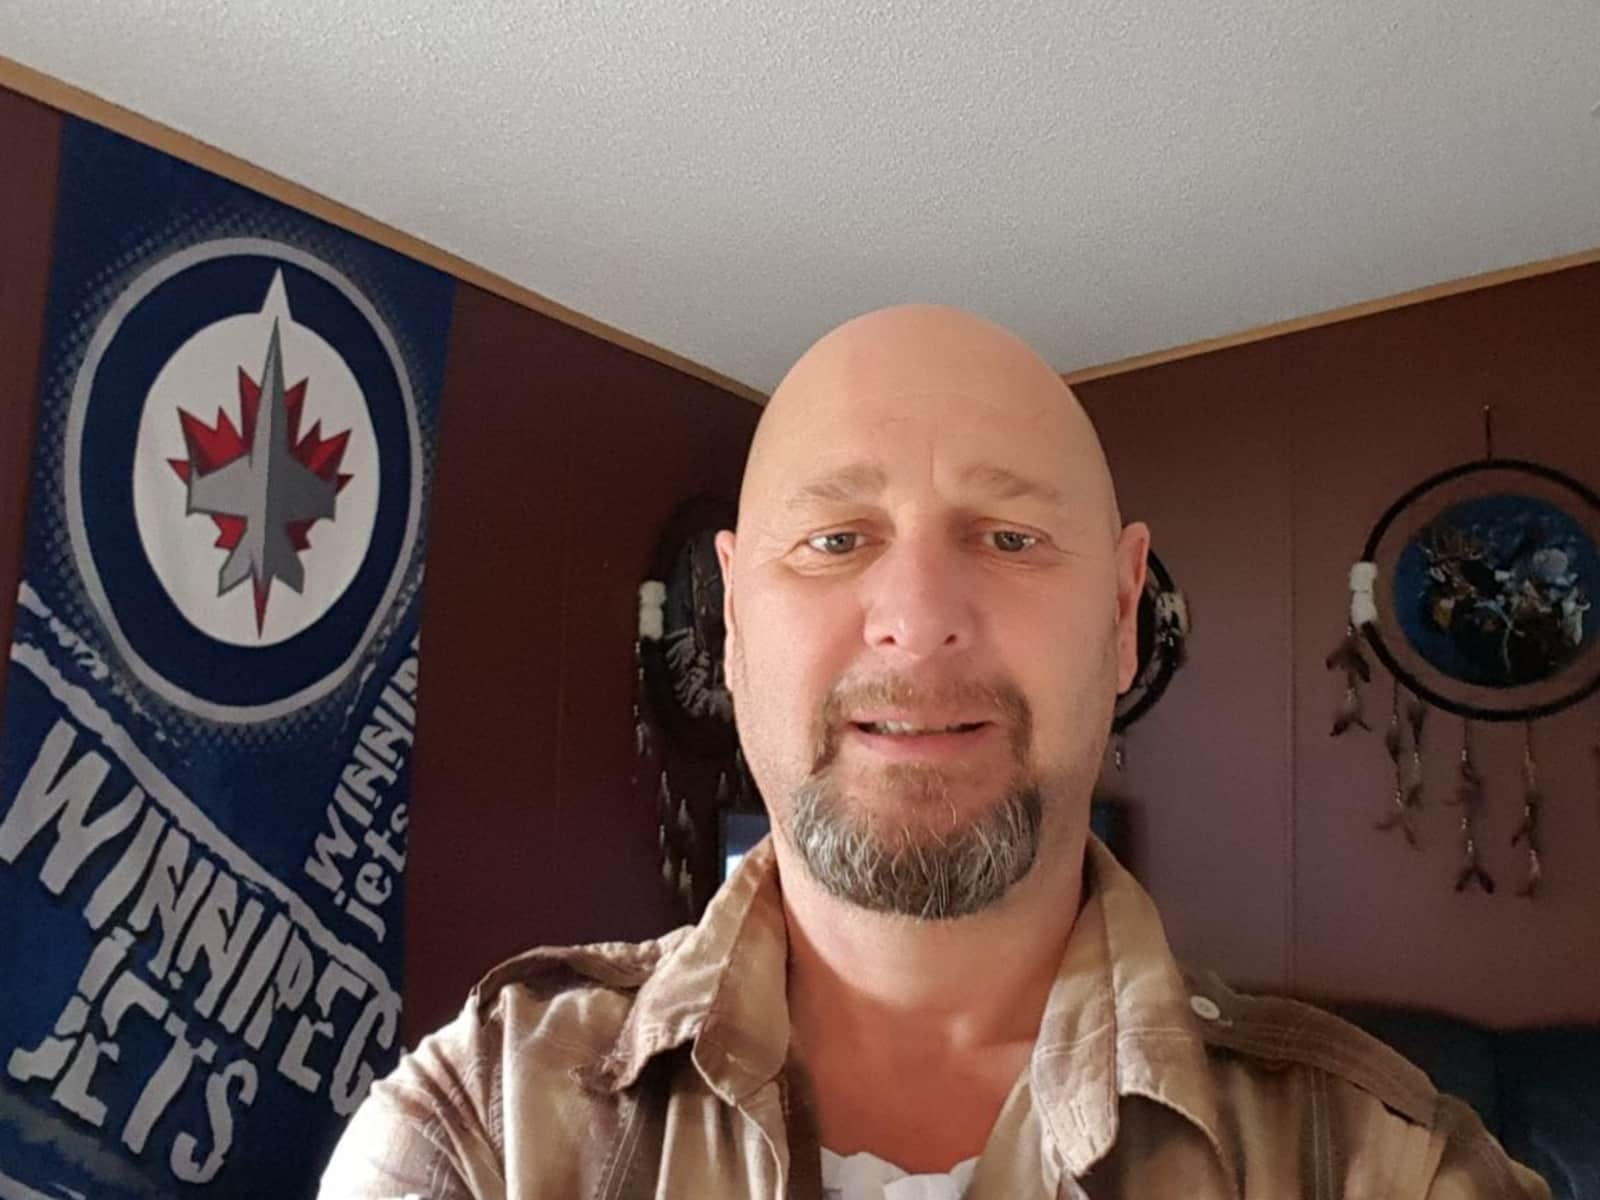 Michael from Kelowna, British Columbia, Canada